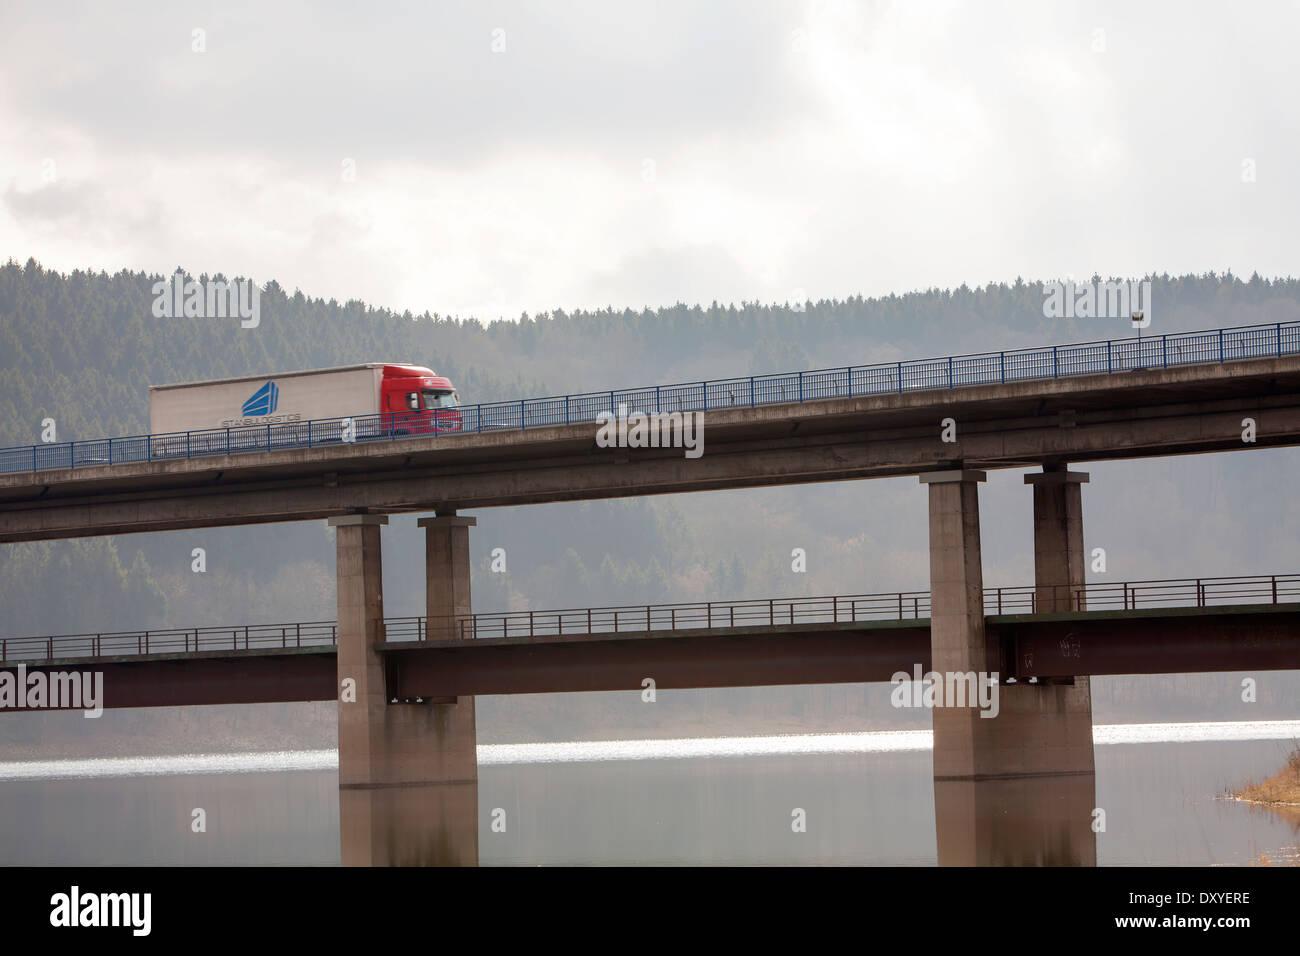 Bridge over the Biggetalsperre reservoir, Attendorn, Germany, Europe - Stock Image